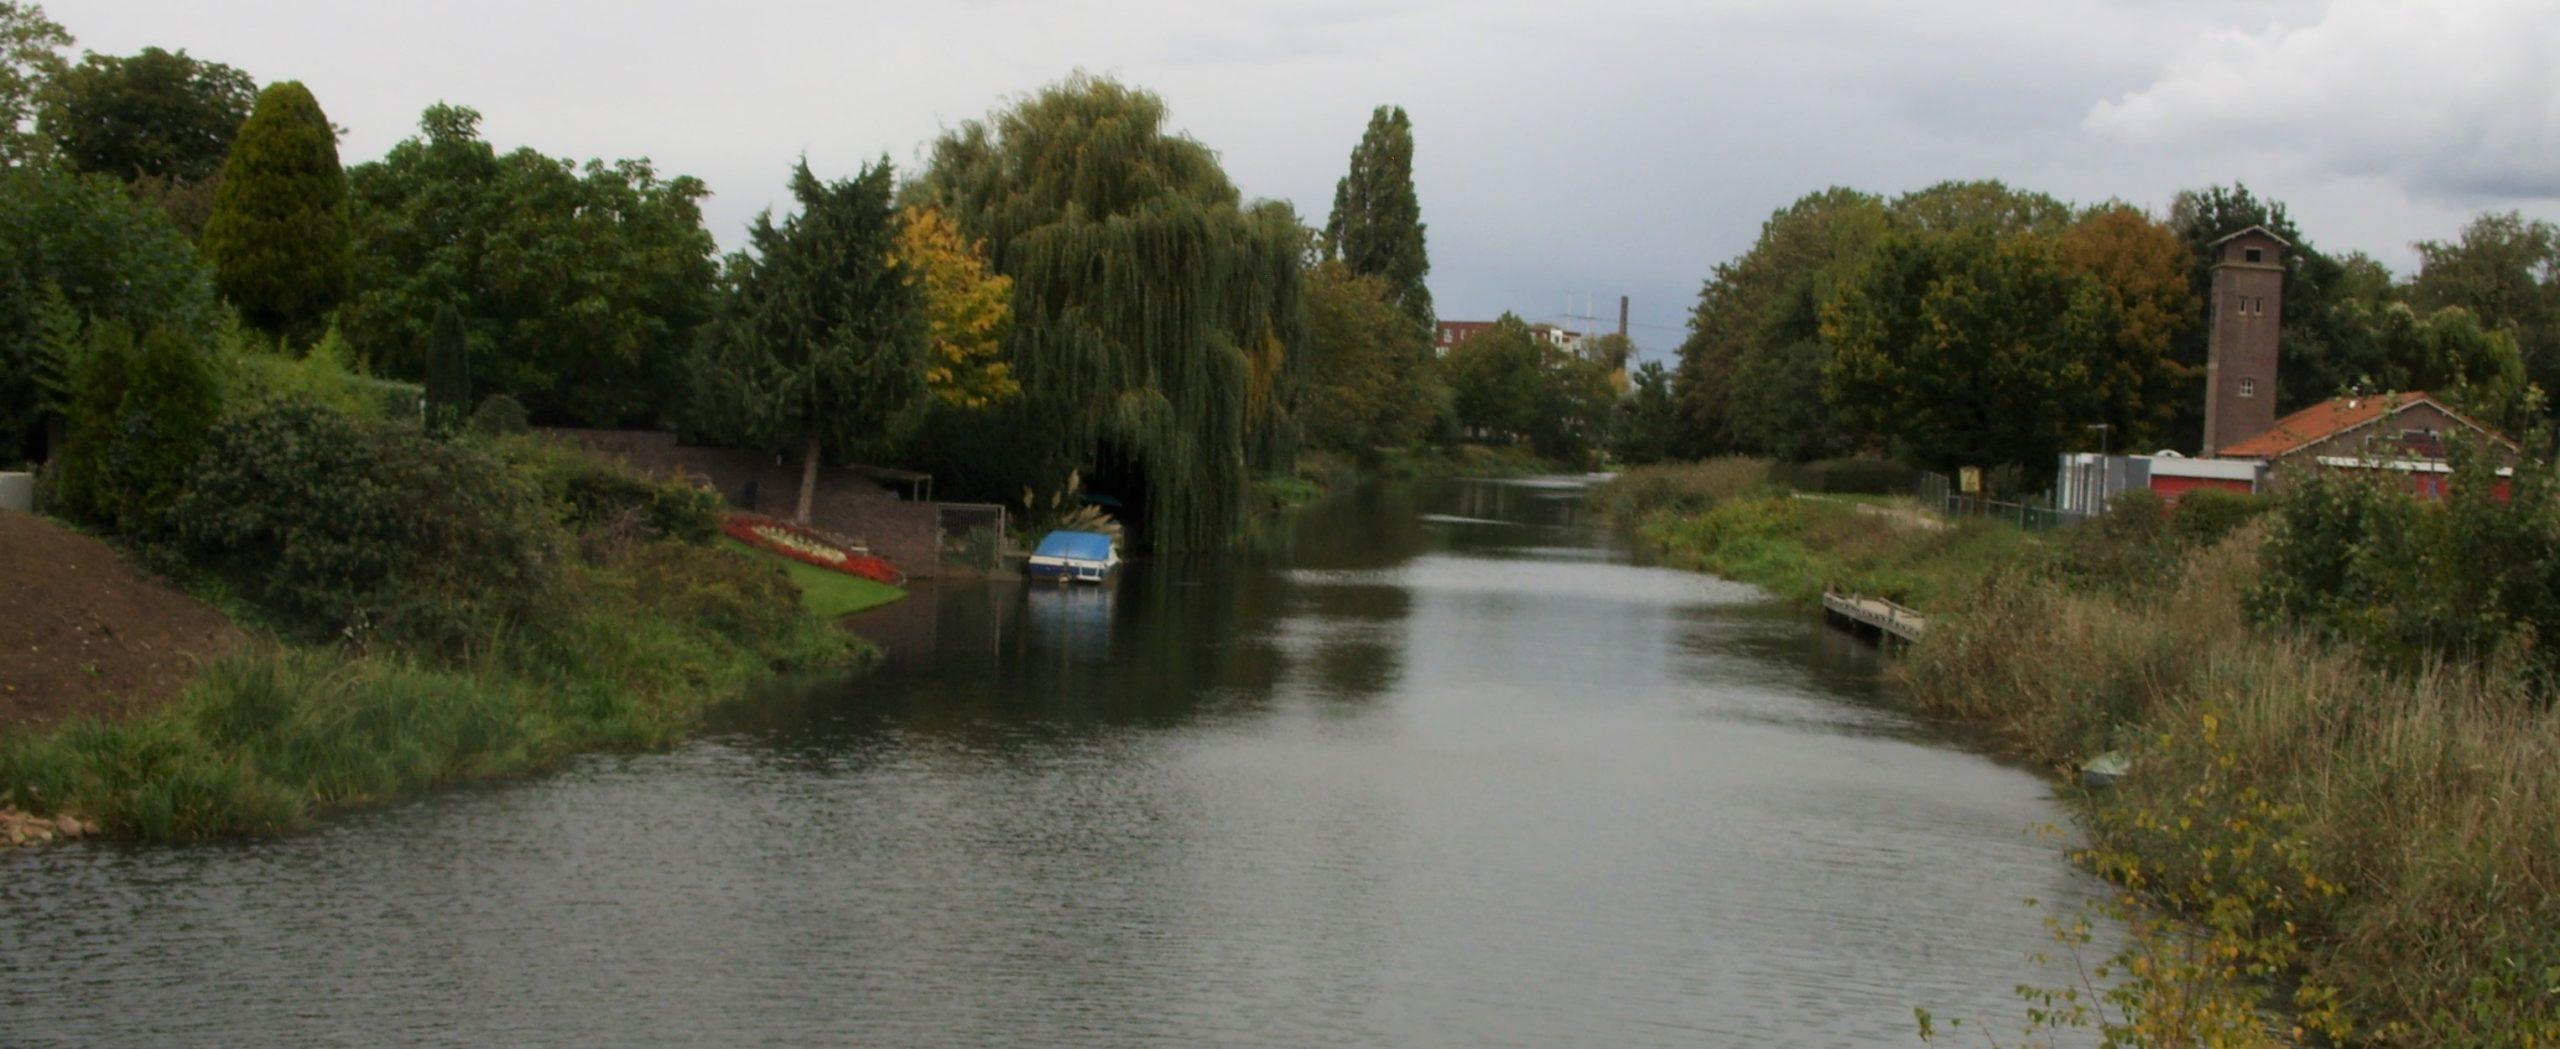 De Oude IJssel